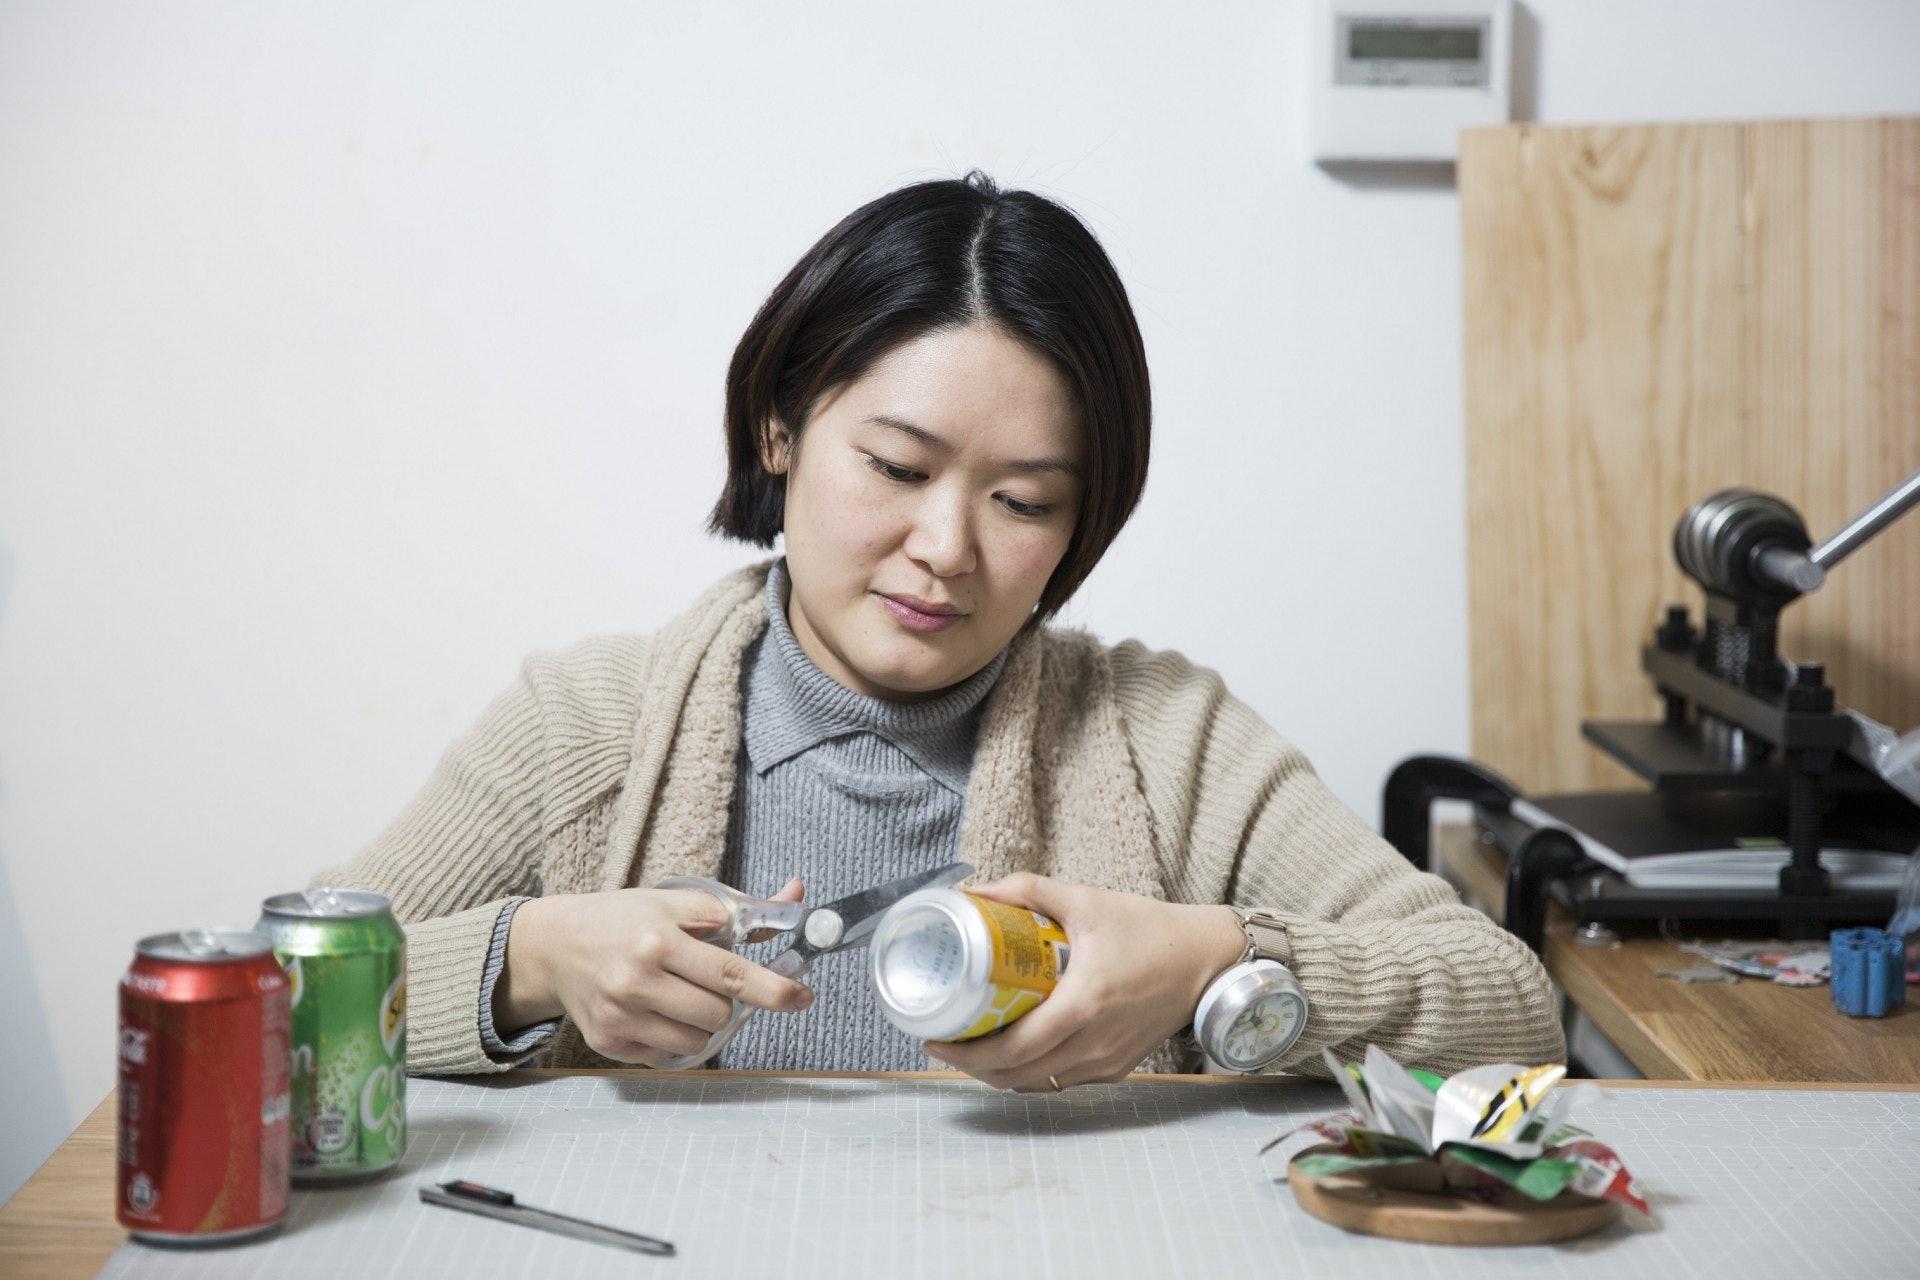 Alchemist Creations創辦人及創意總監Kat Ling認為,世上並沒100%環保的東西,只能從設計上盡量將壞影響減到最低。(黃寶瑩攝)